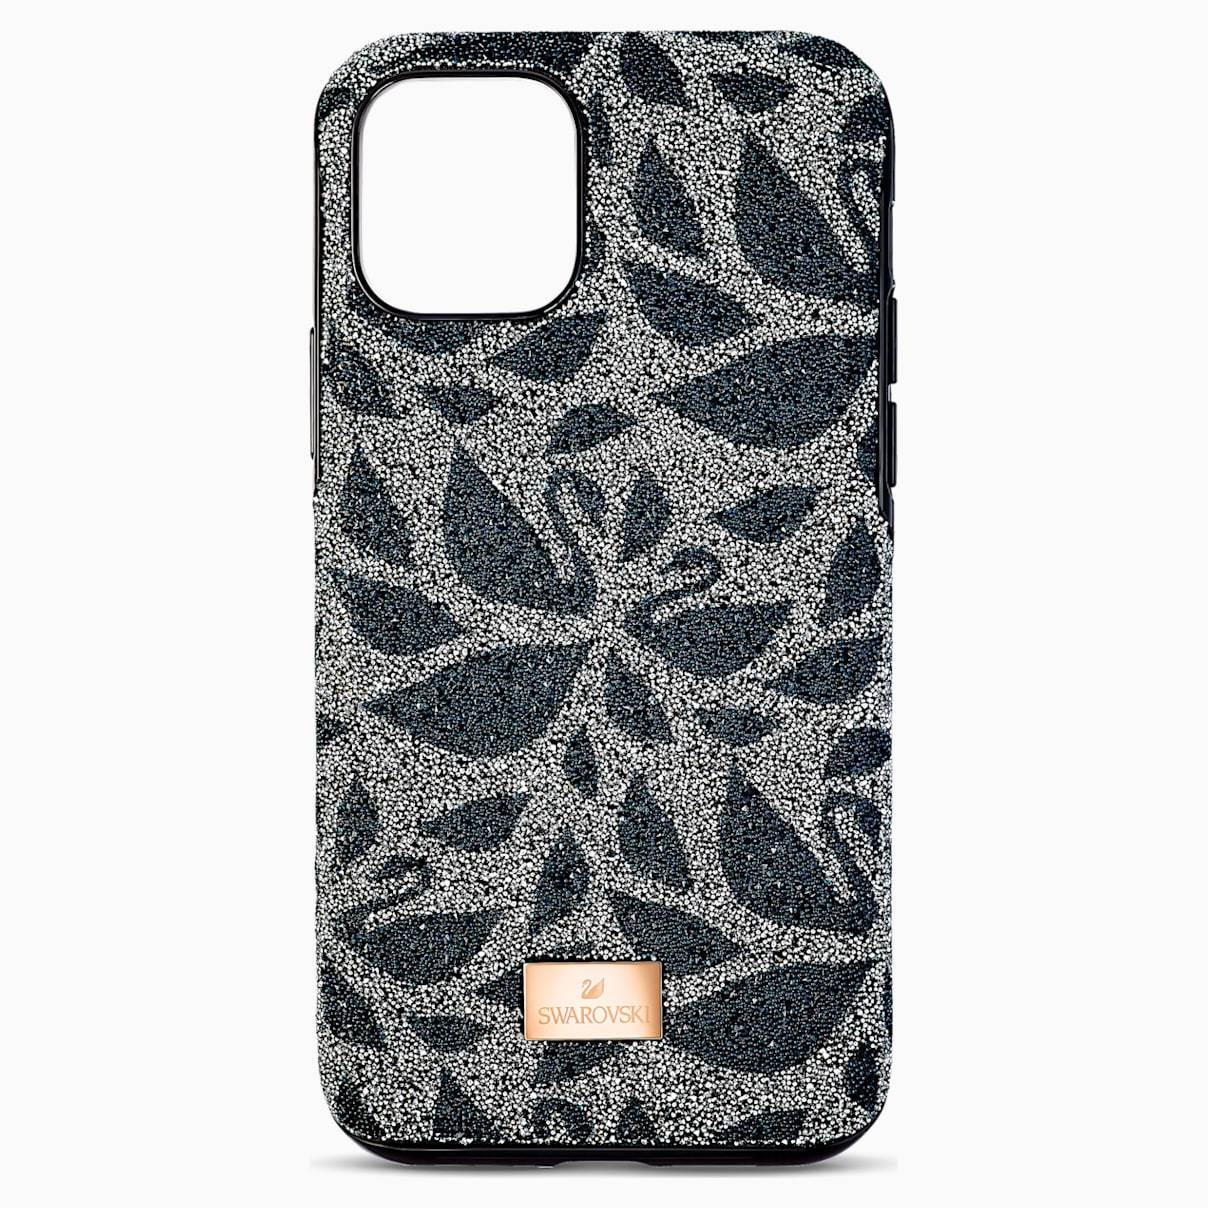 Swarovski Swanflower Smartphone Case with Bumper, iPhone® 11 Pro Max, Black